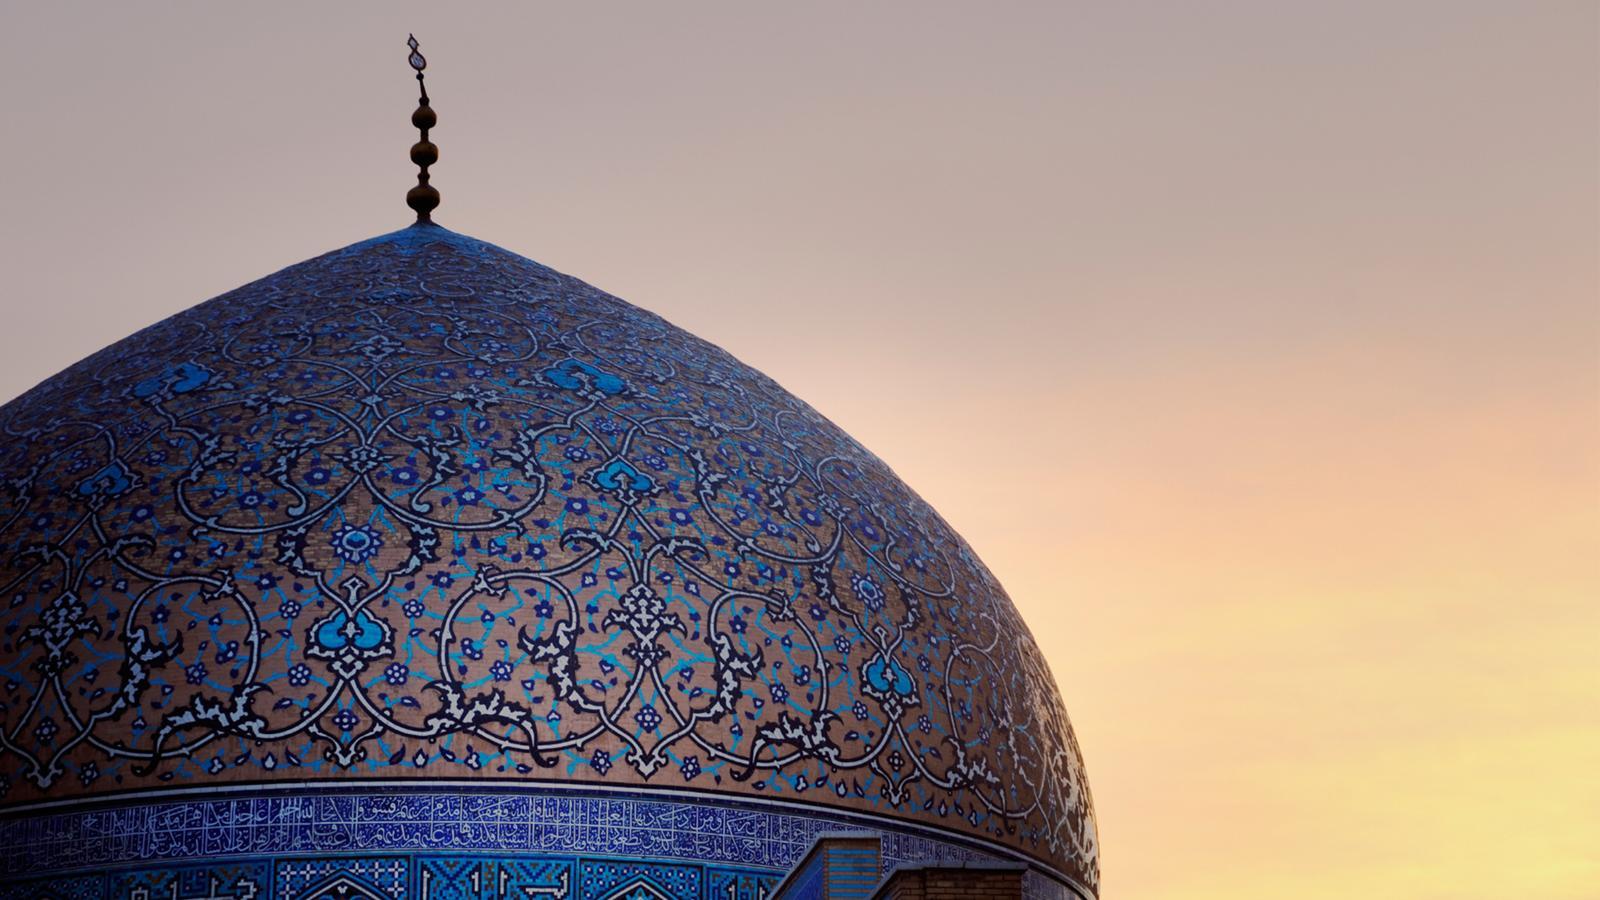 iran - photo #47